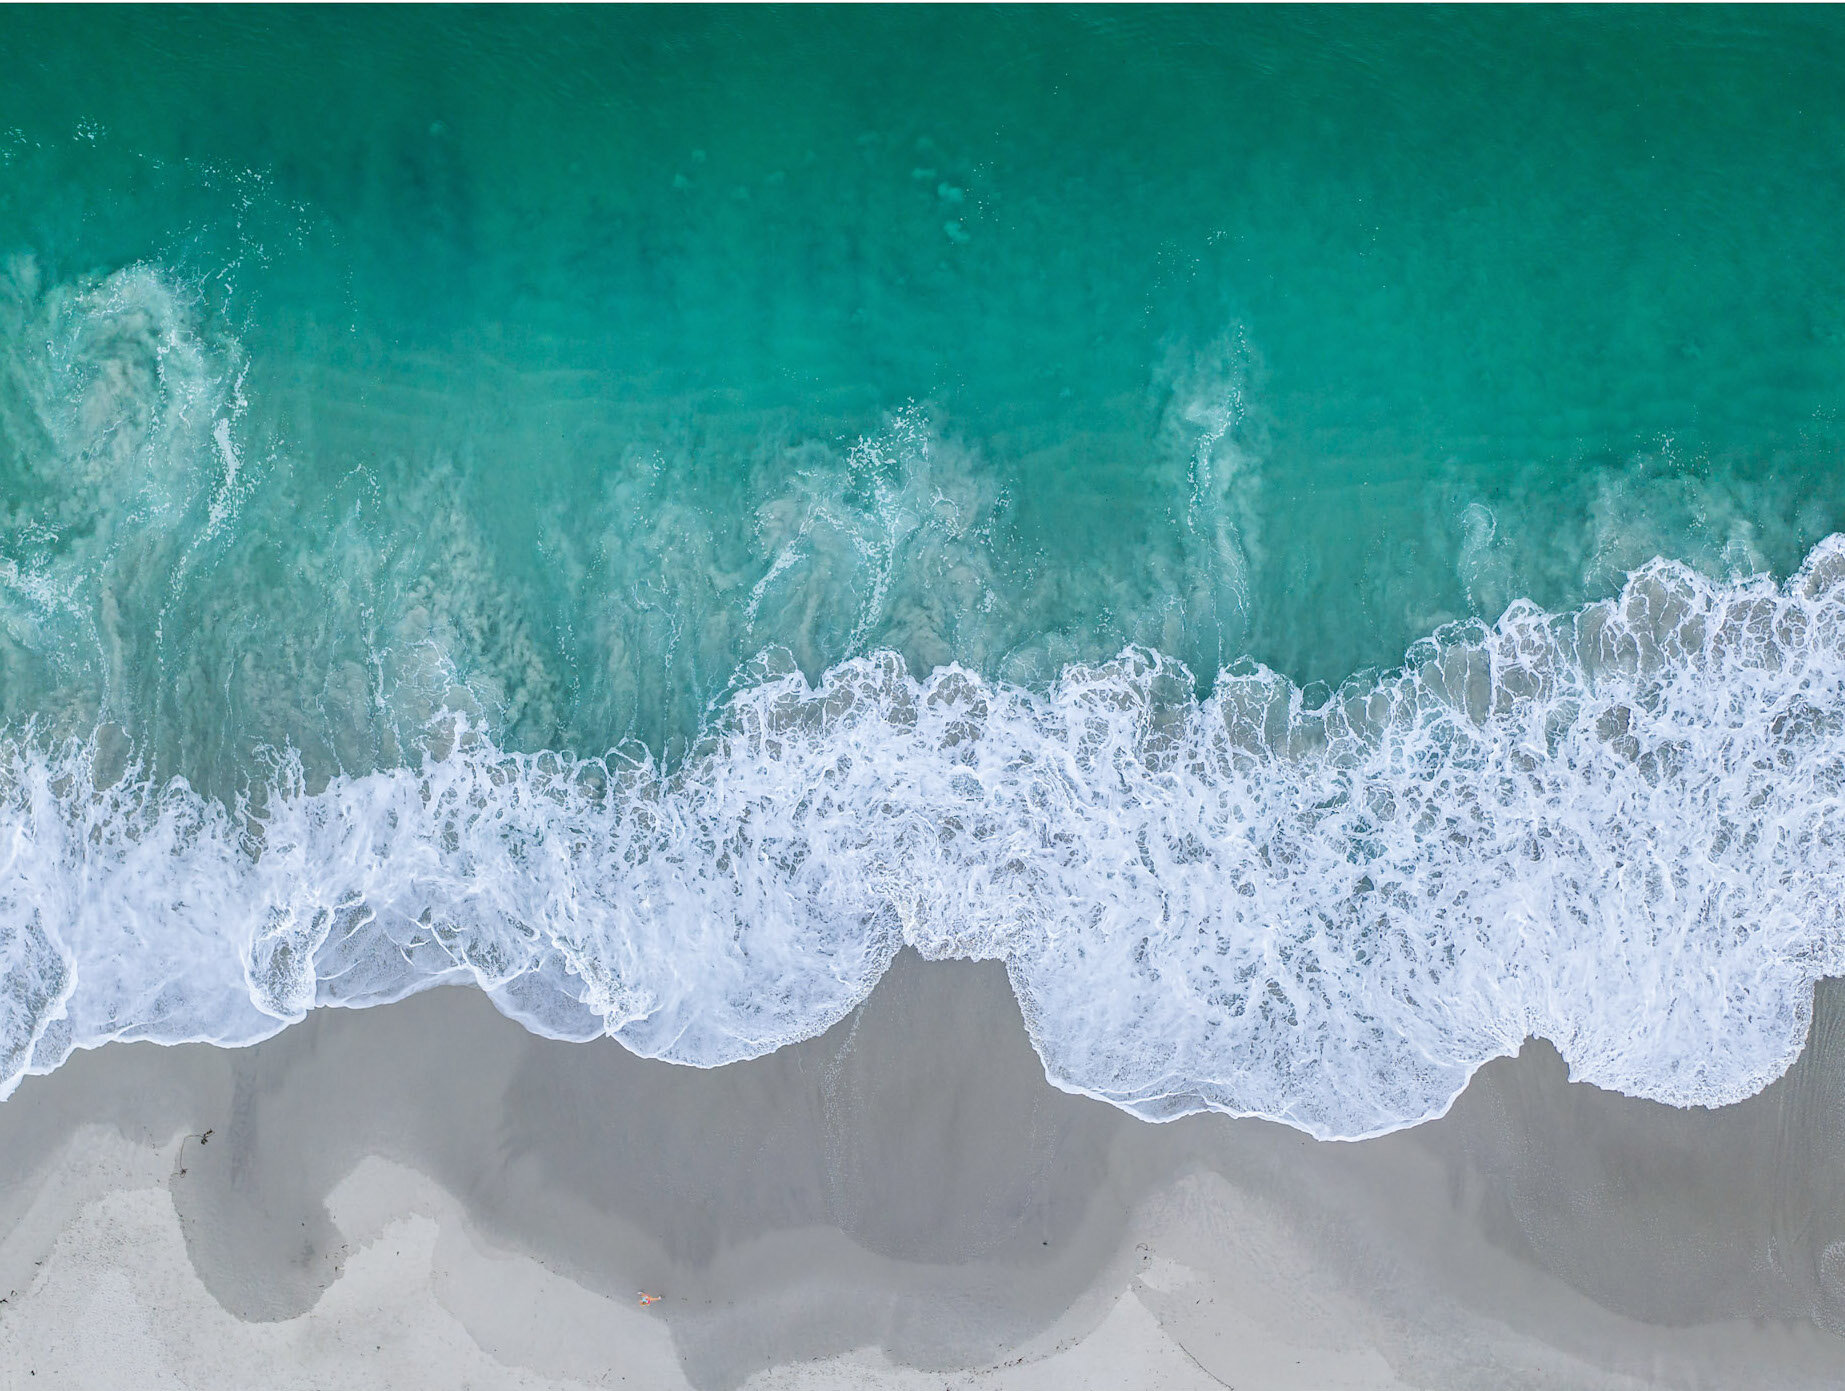 David Ondaatje   Carmel Beach #5 Runner  44 x 34 inch Archival Pigment Print